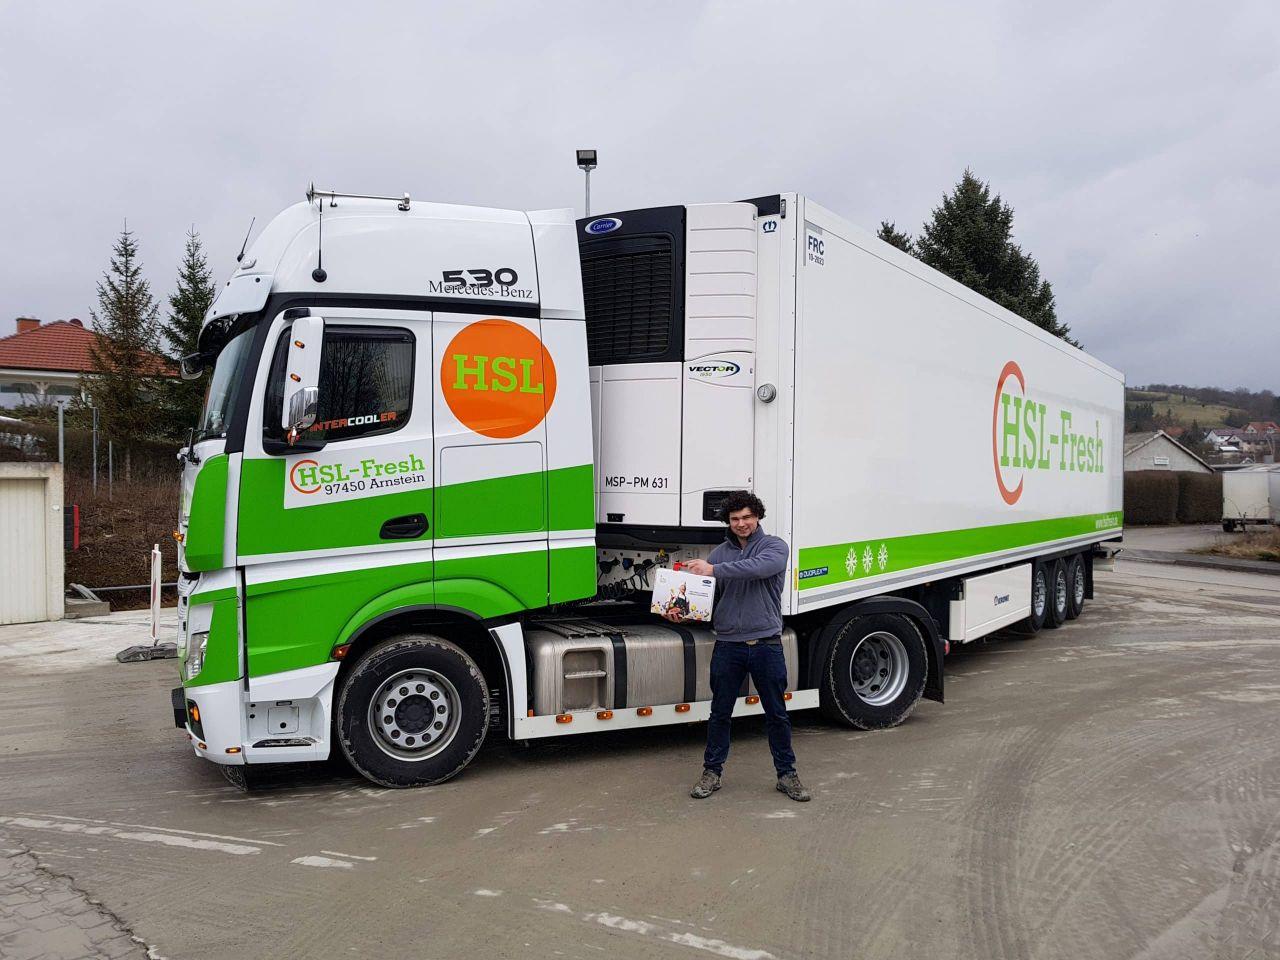 HSL-Fresh: Dieser Logistik-Partner ist total fresh